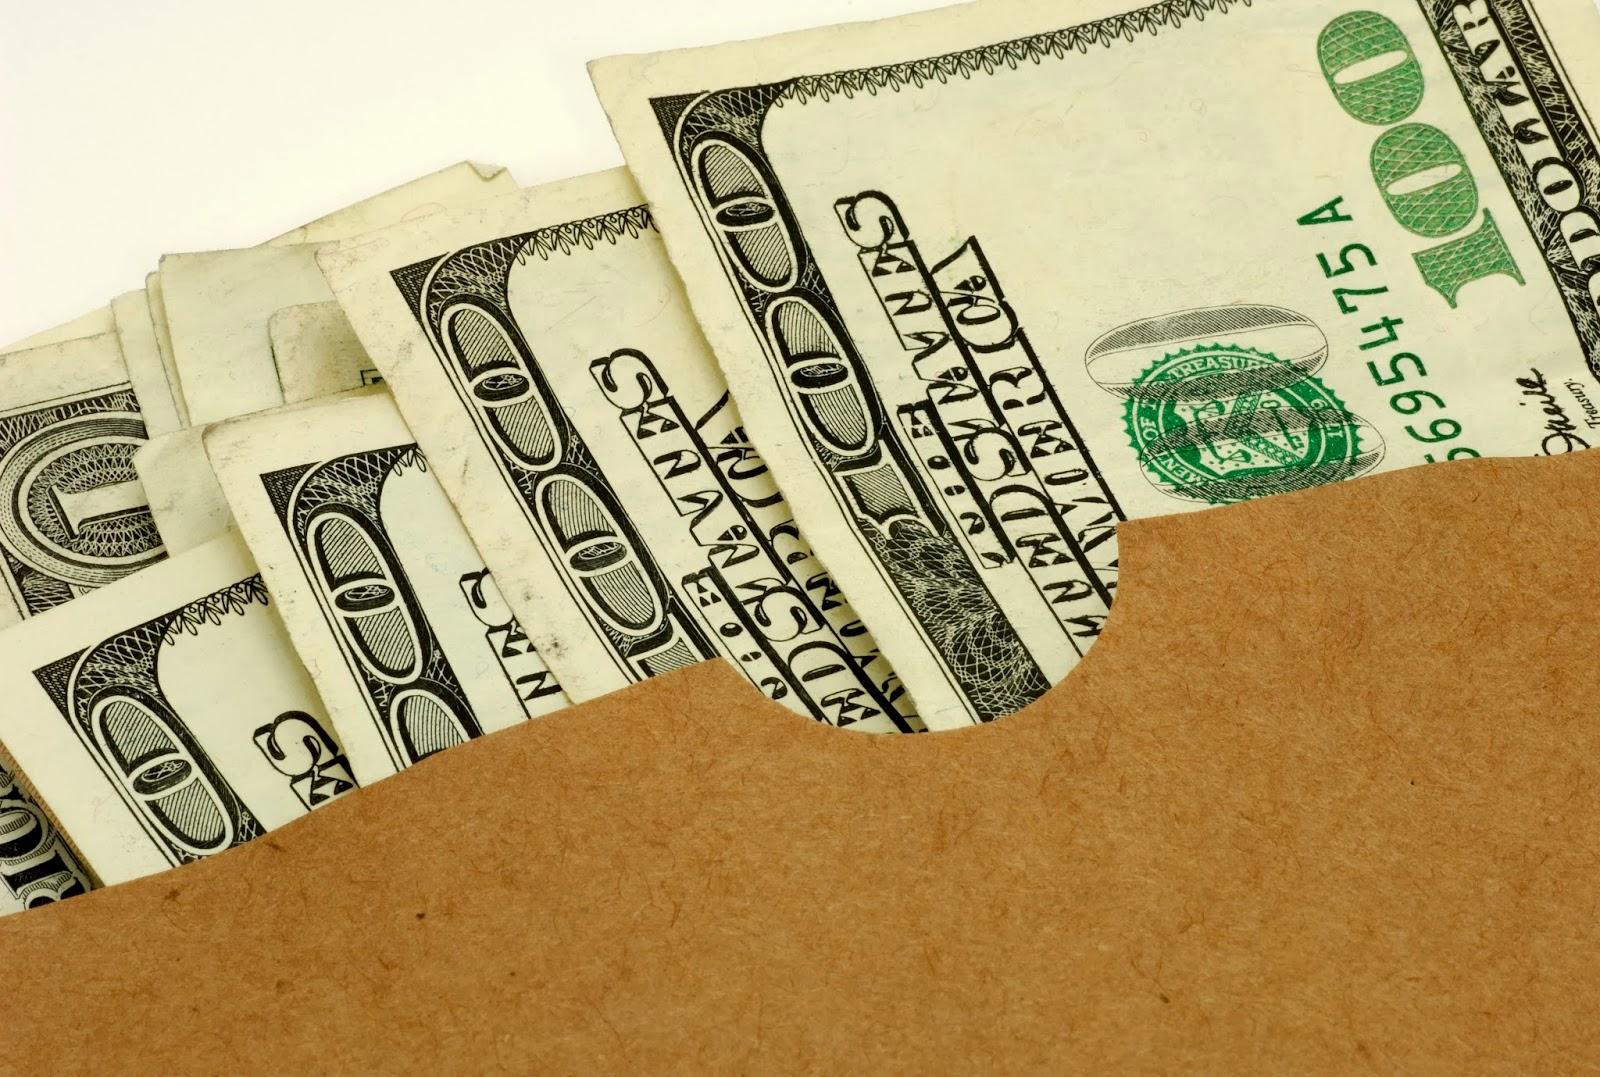 Cash in paper bag